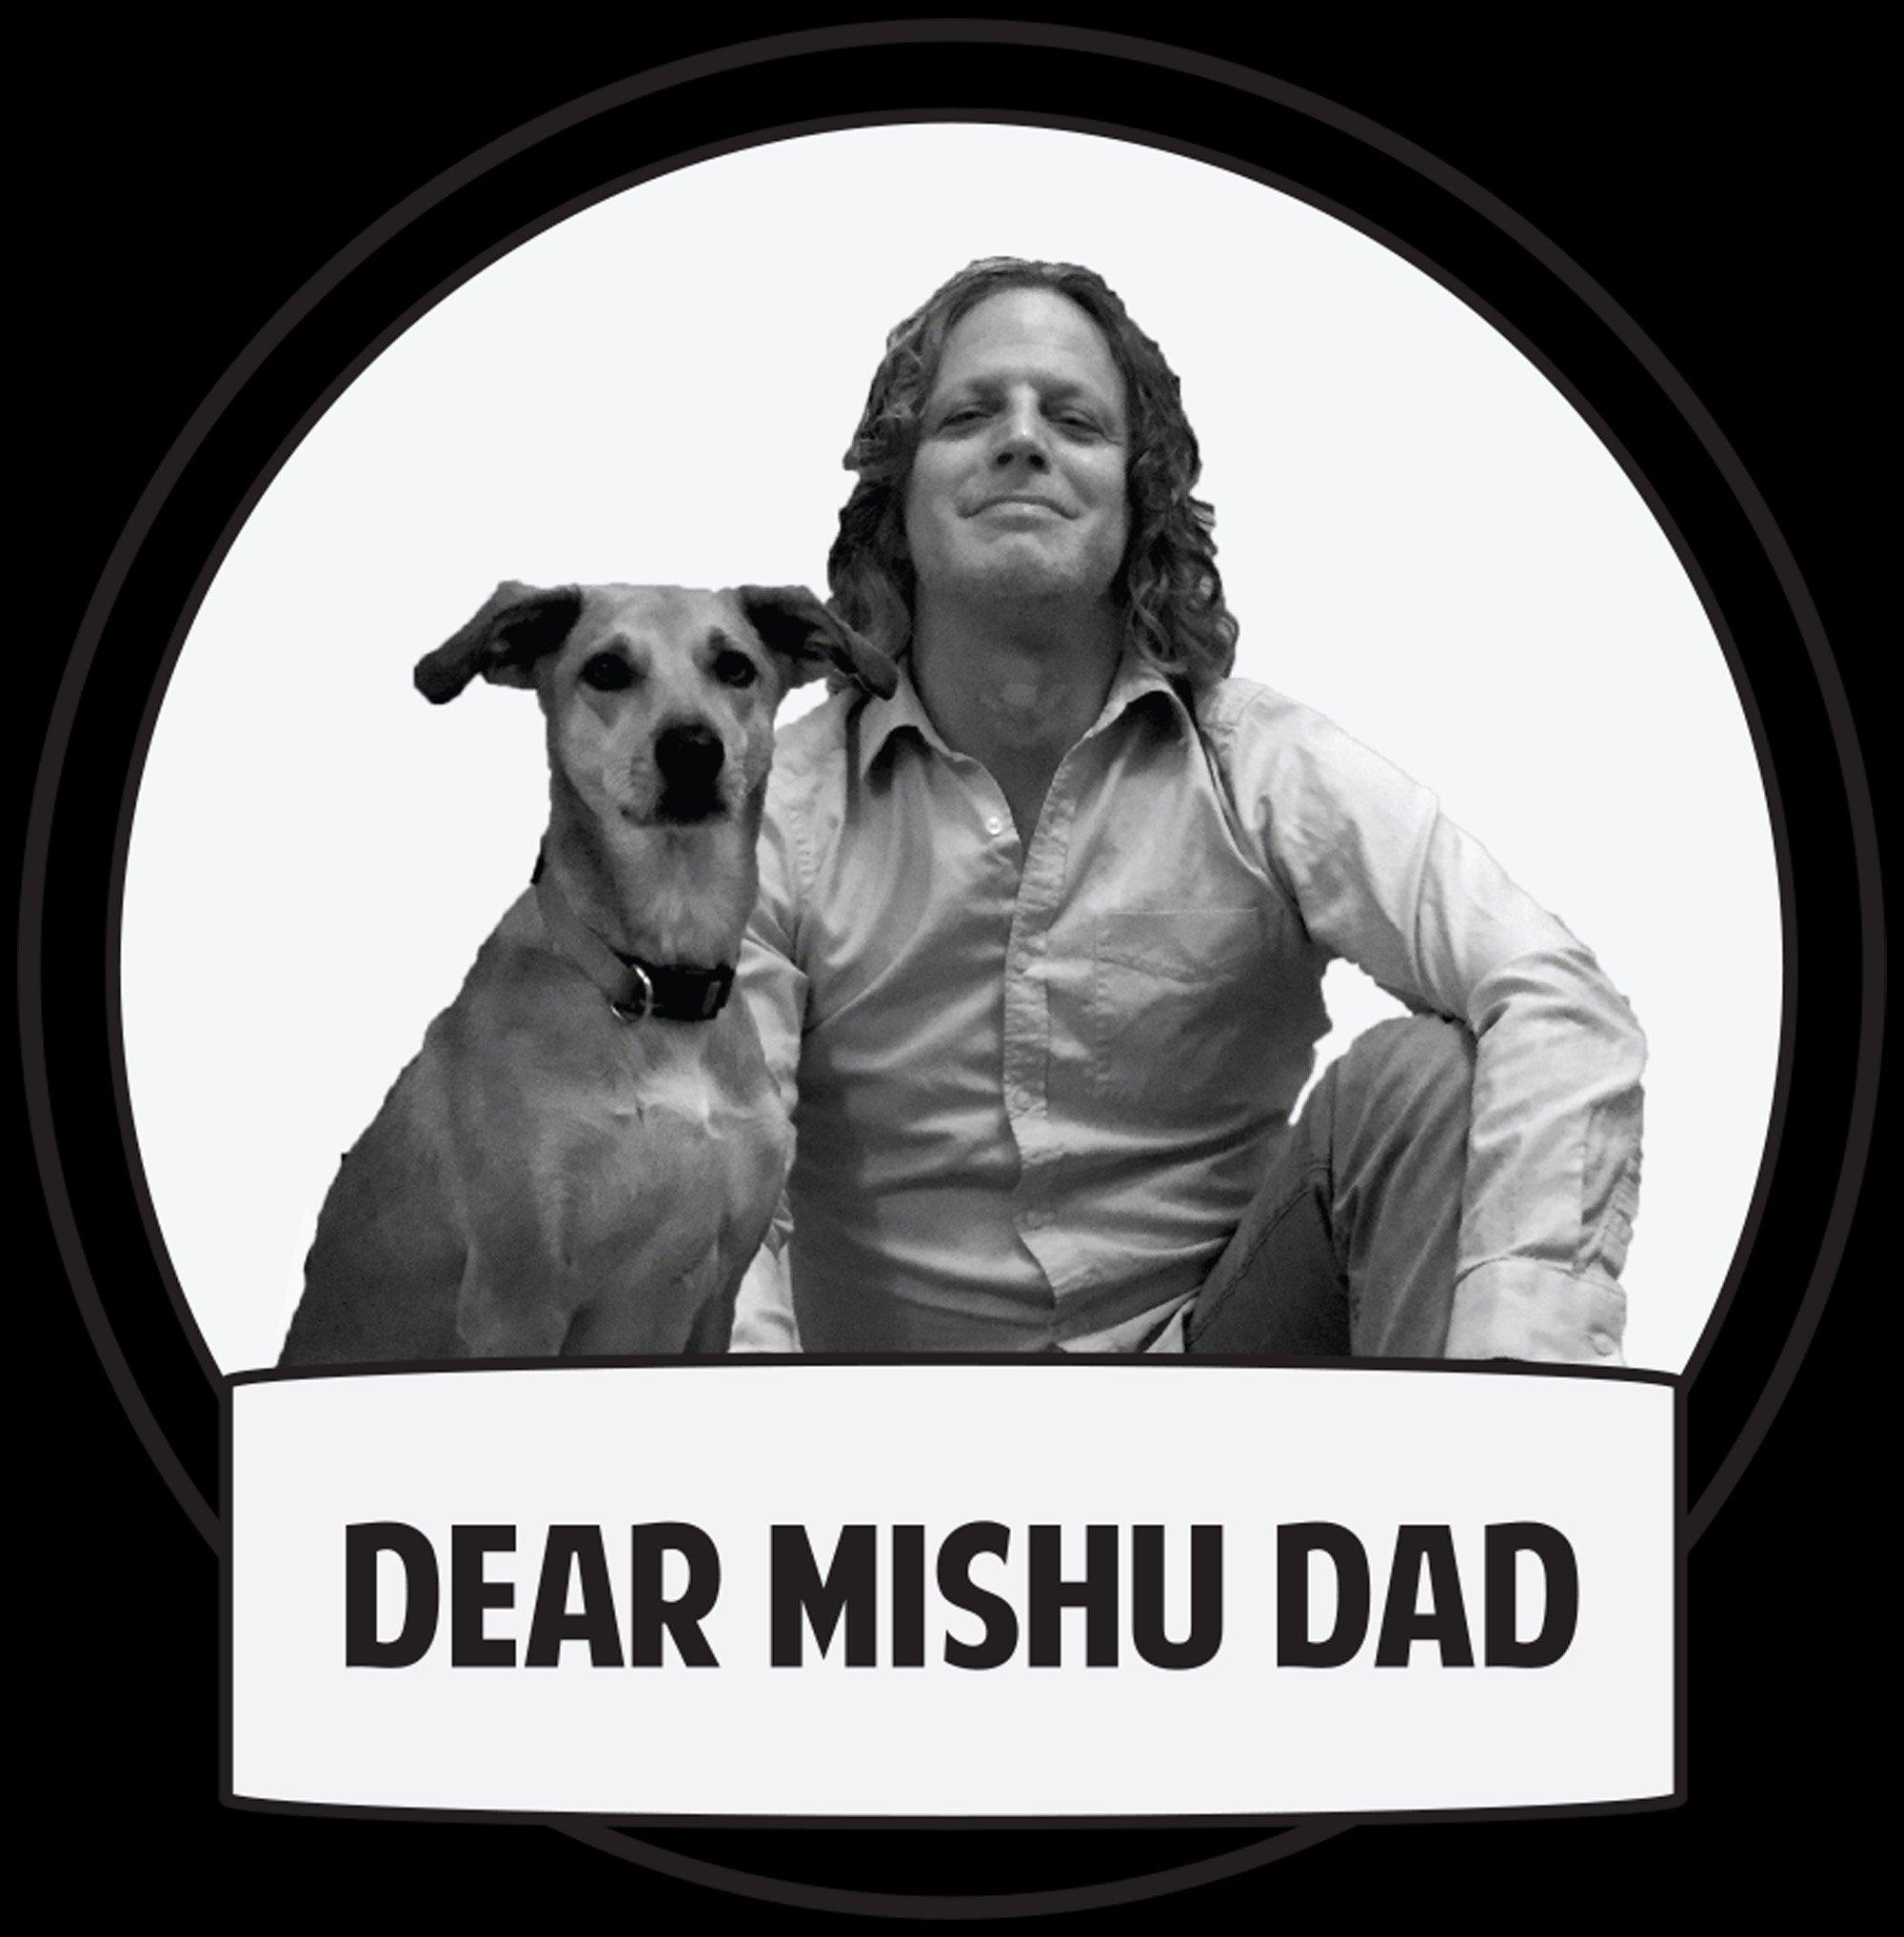 @DearMishuDad